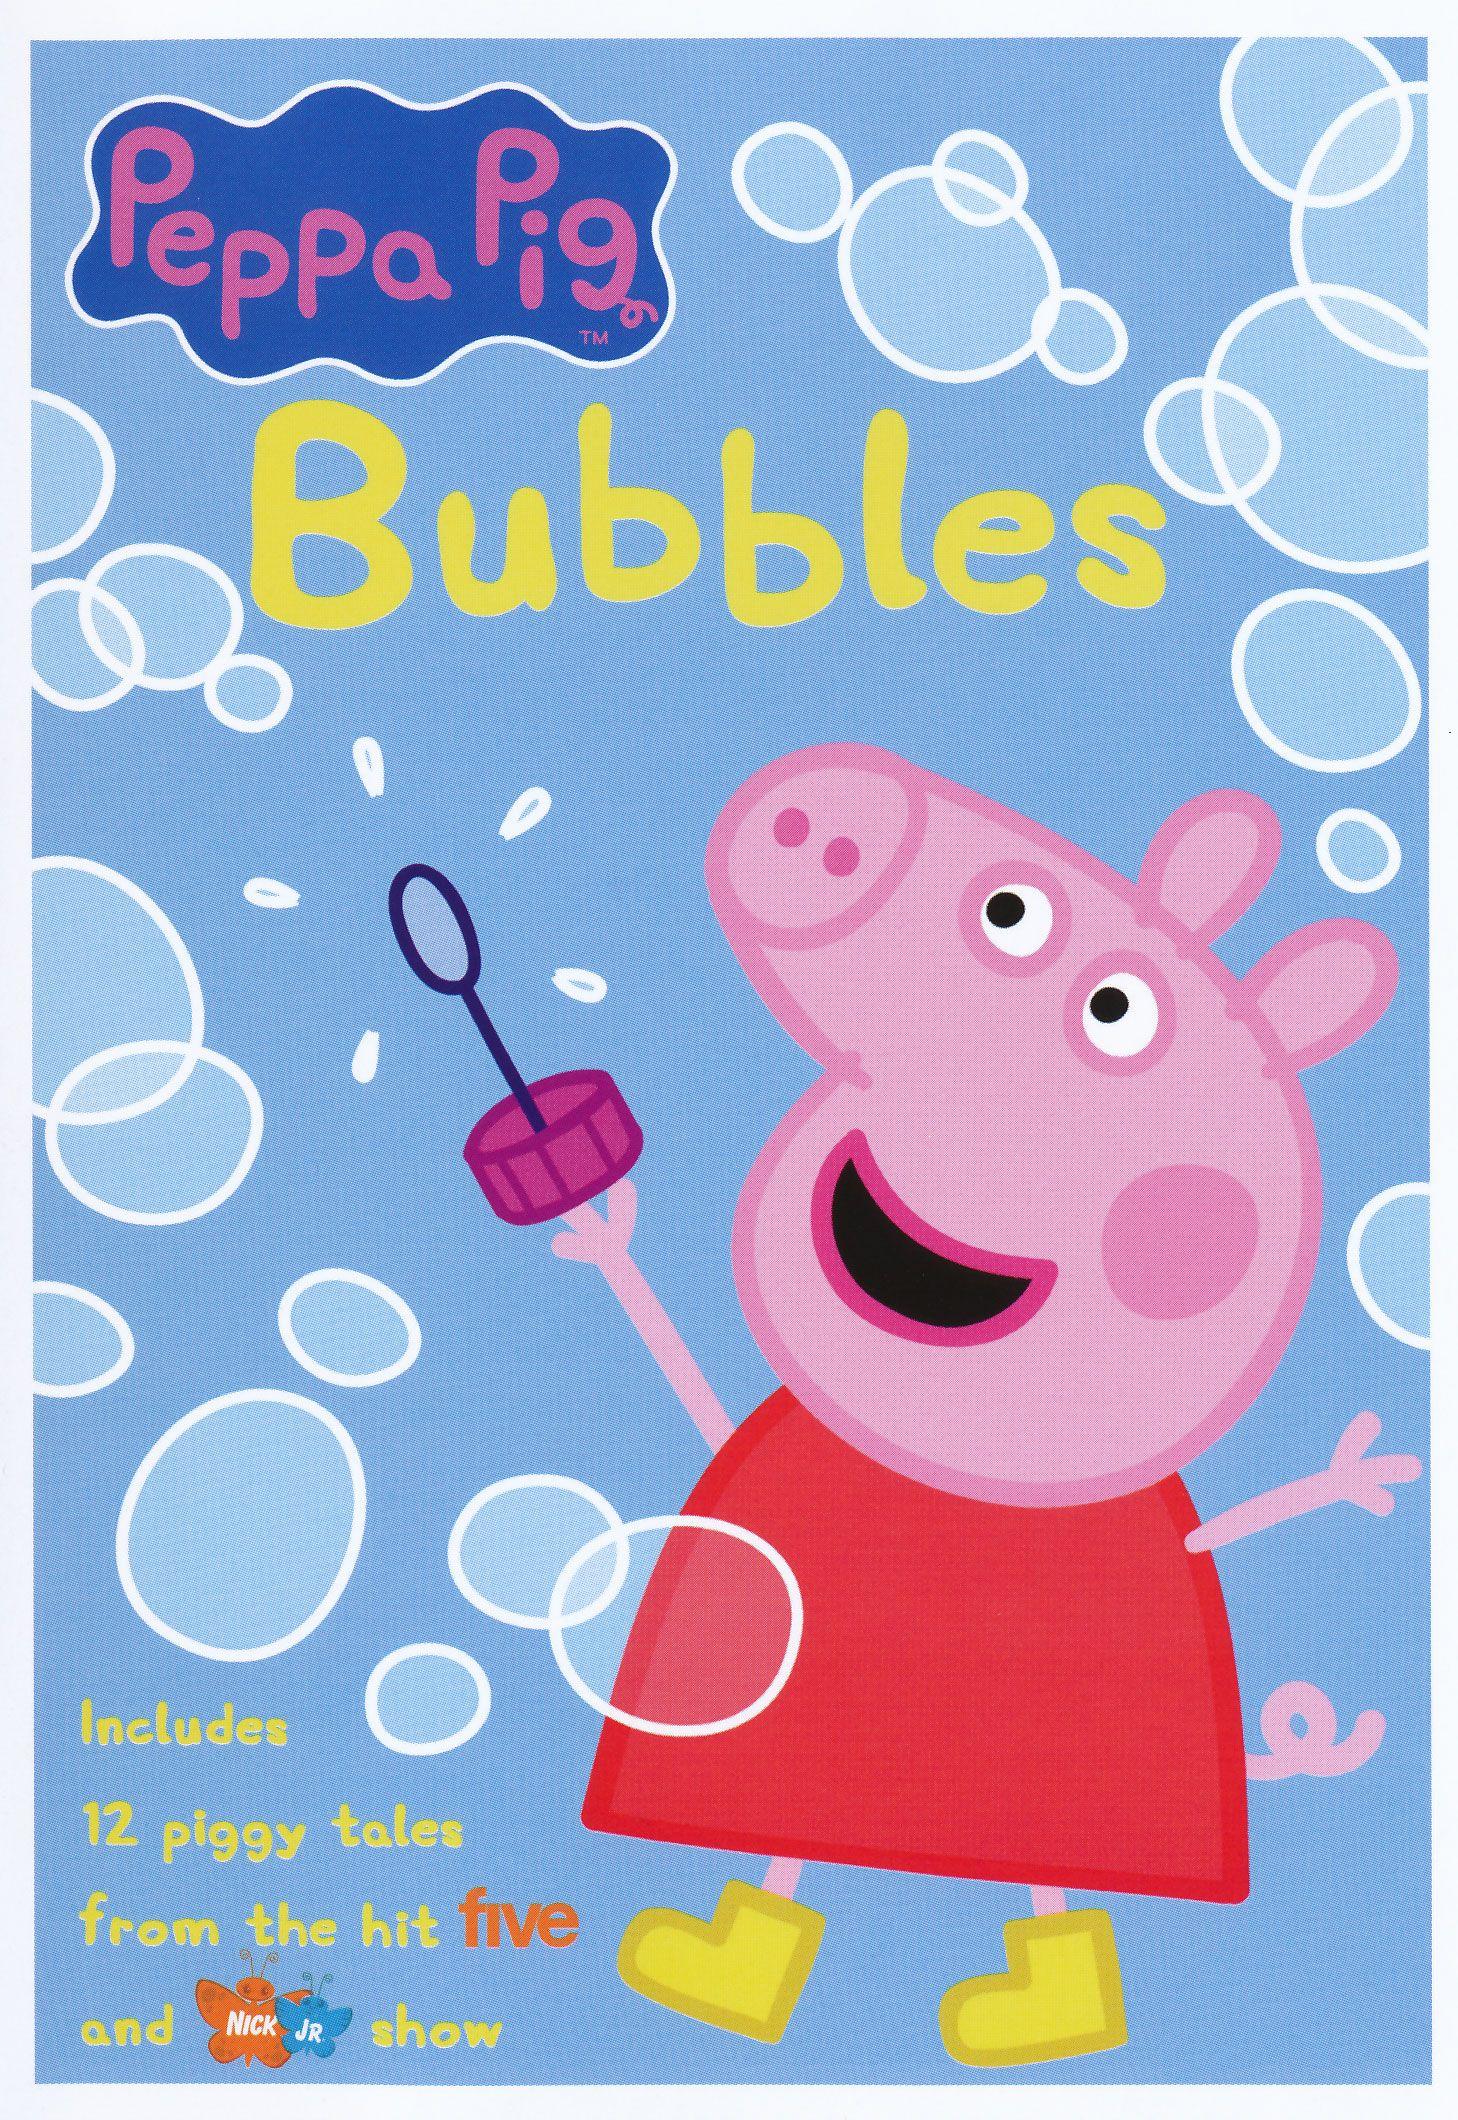 Peppa Pig wallpapers Fairy Tales / Cartoon Pinterest